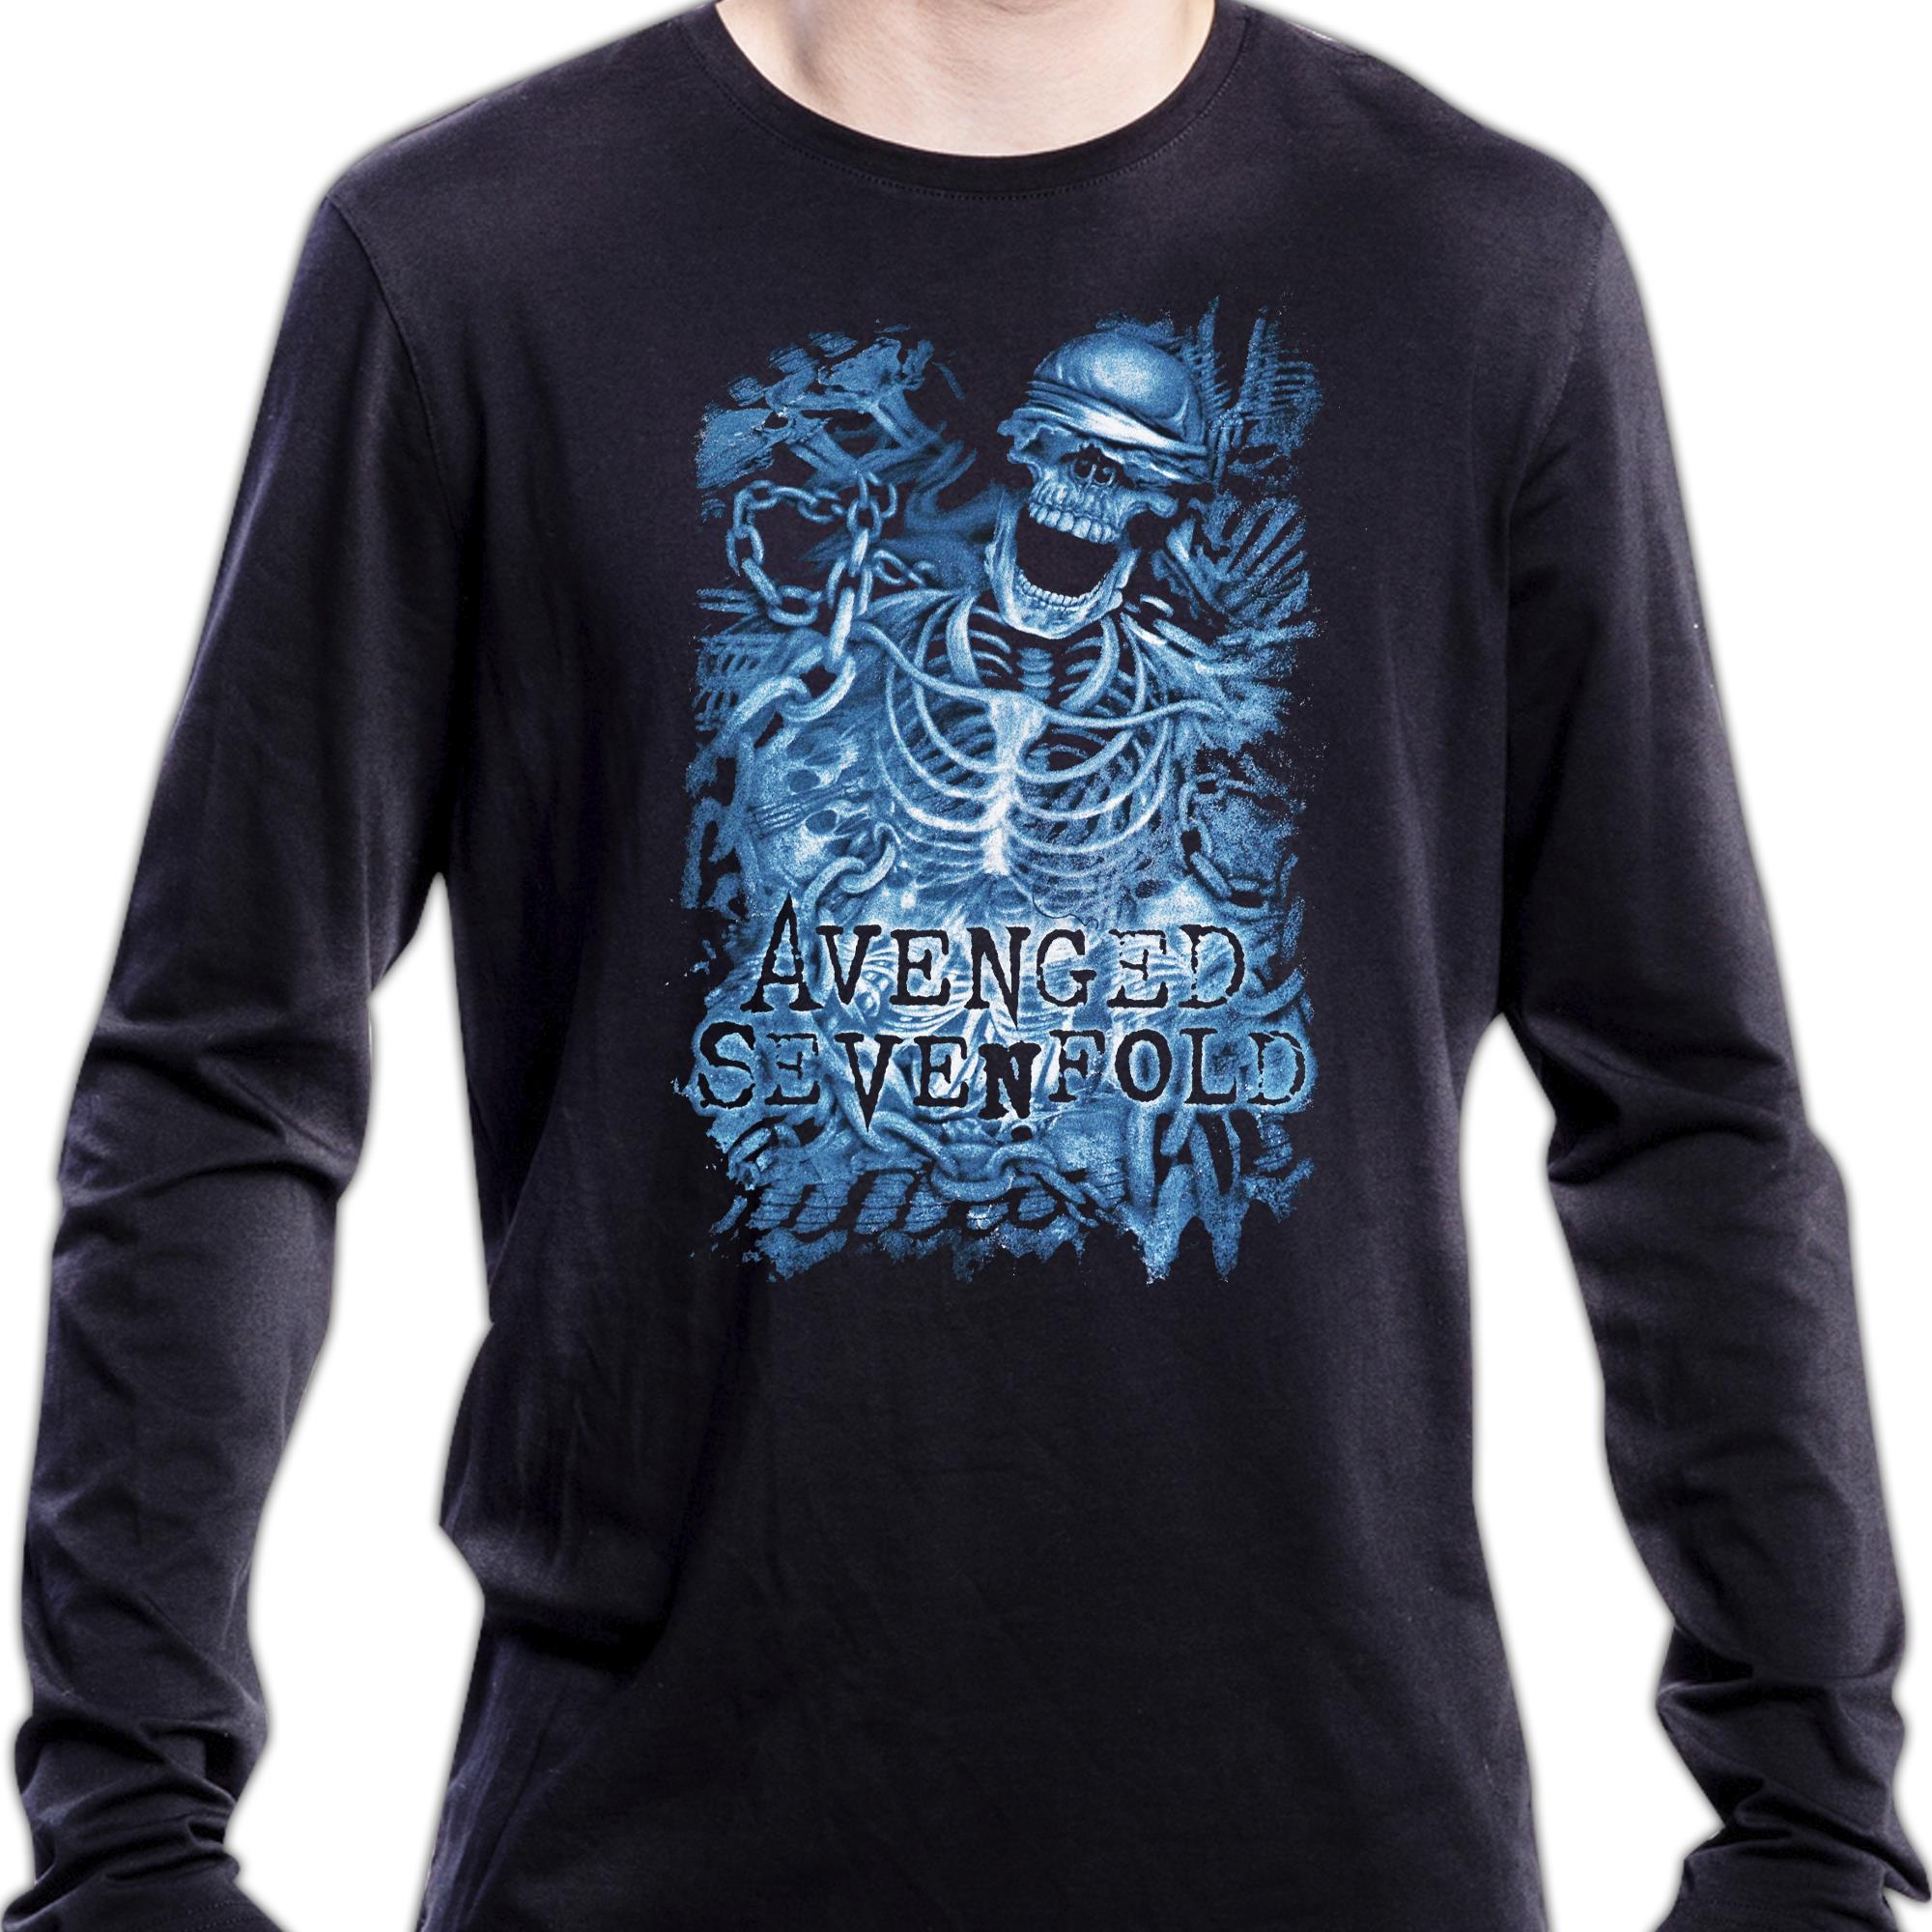 Chained Skeleton Longsleeve shirt (Import)